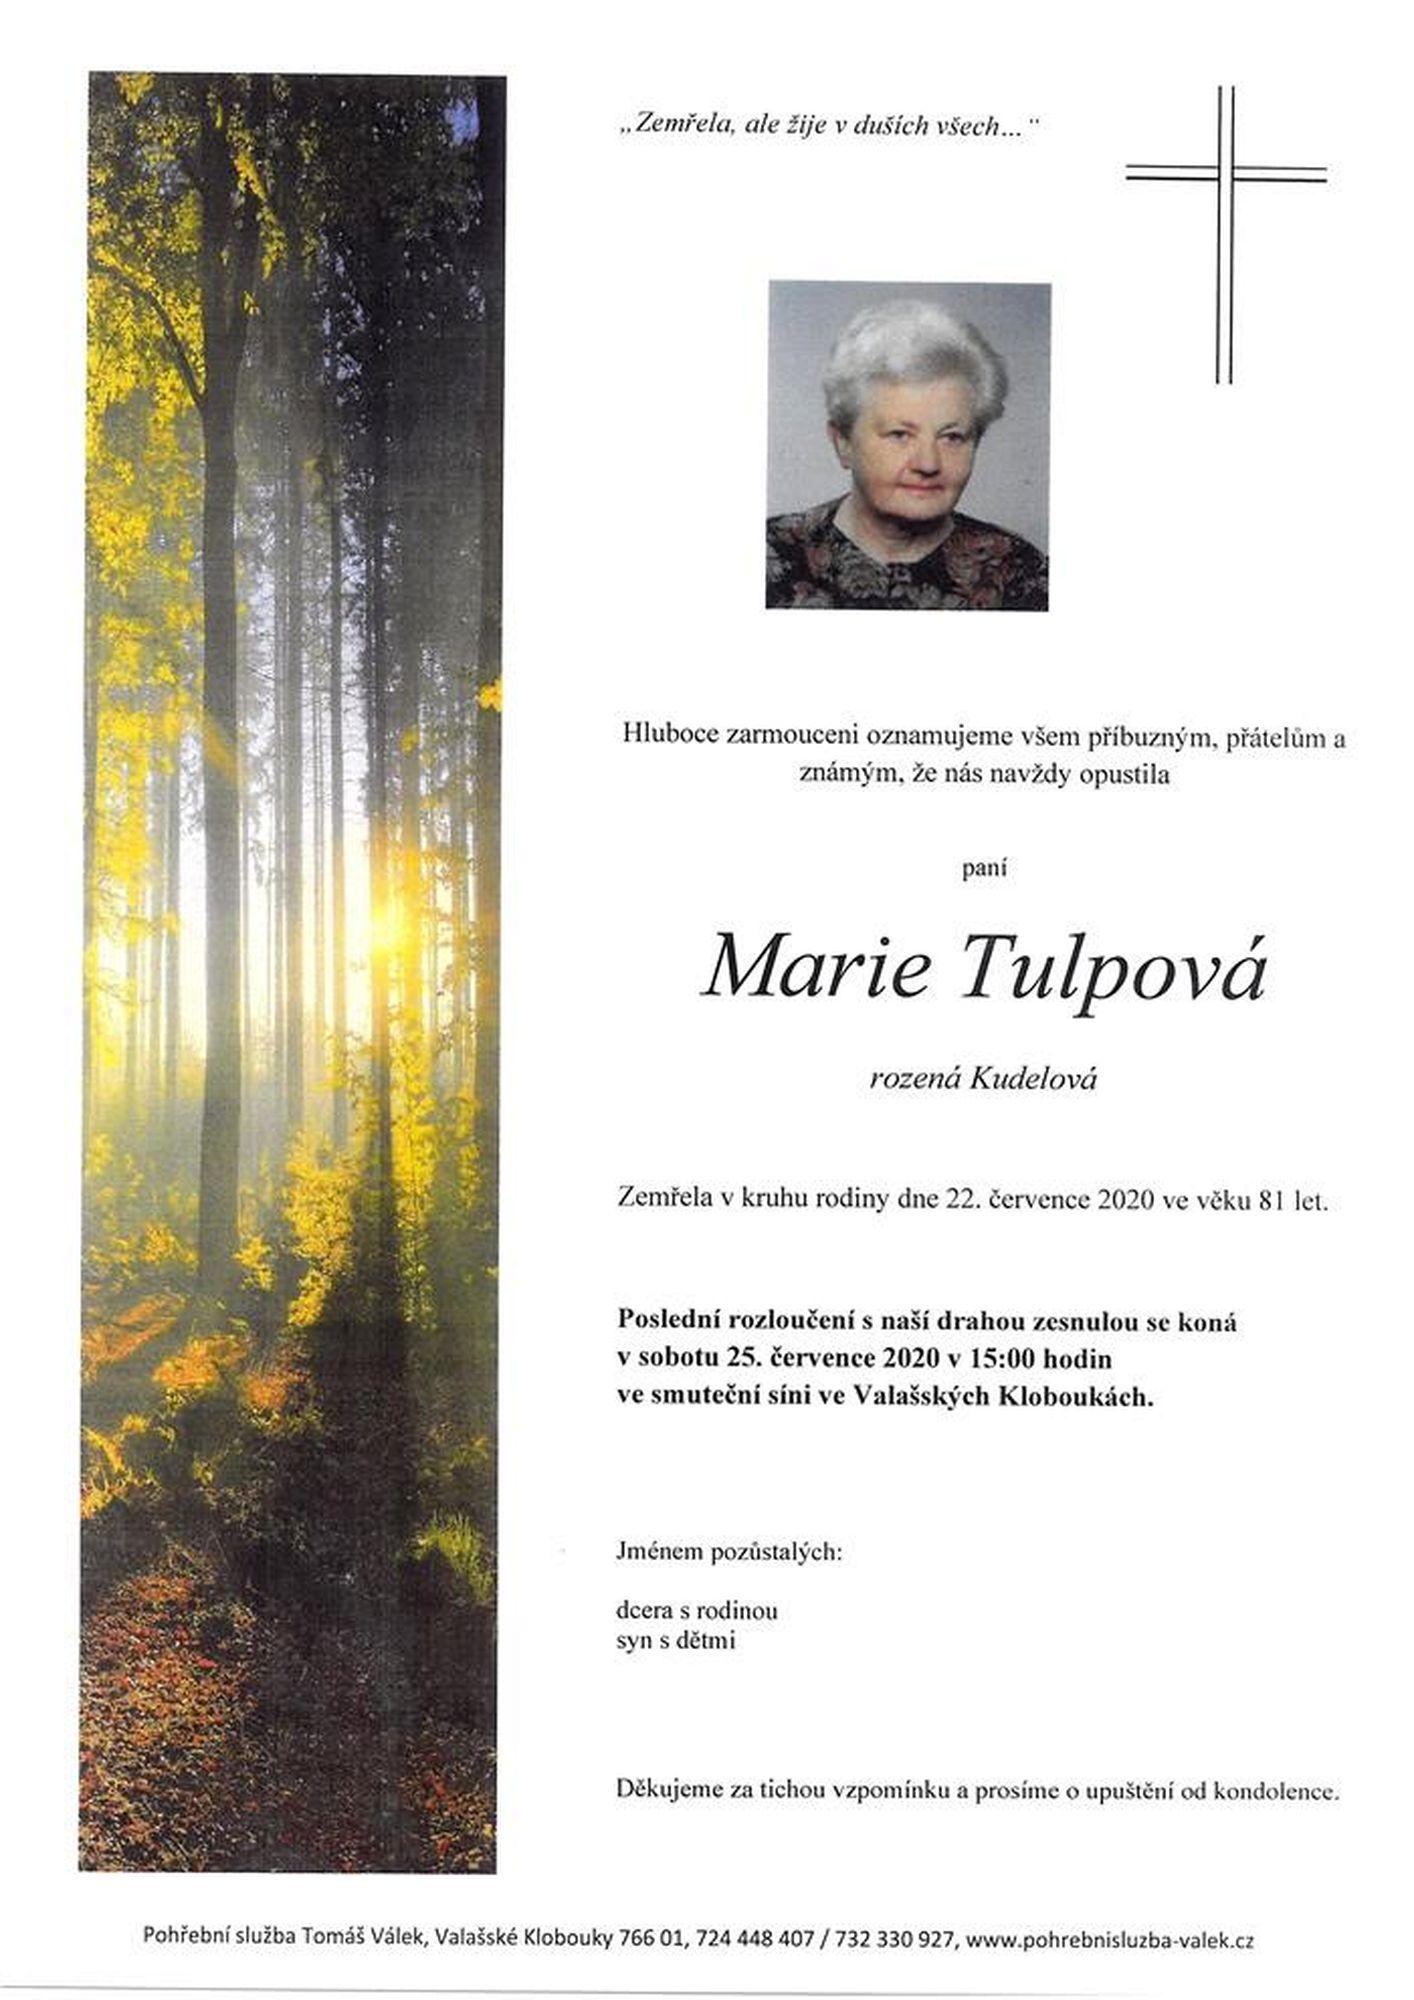 Marie Tulpová